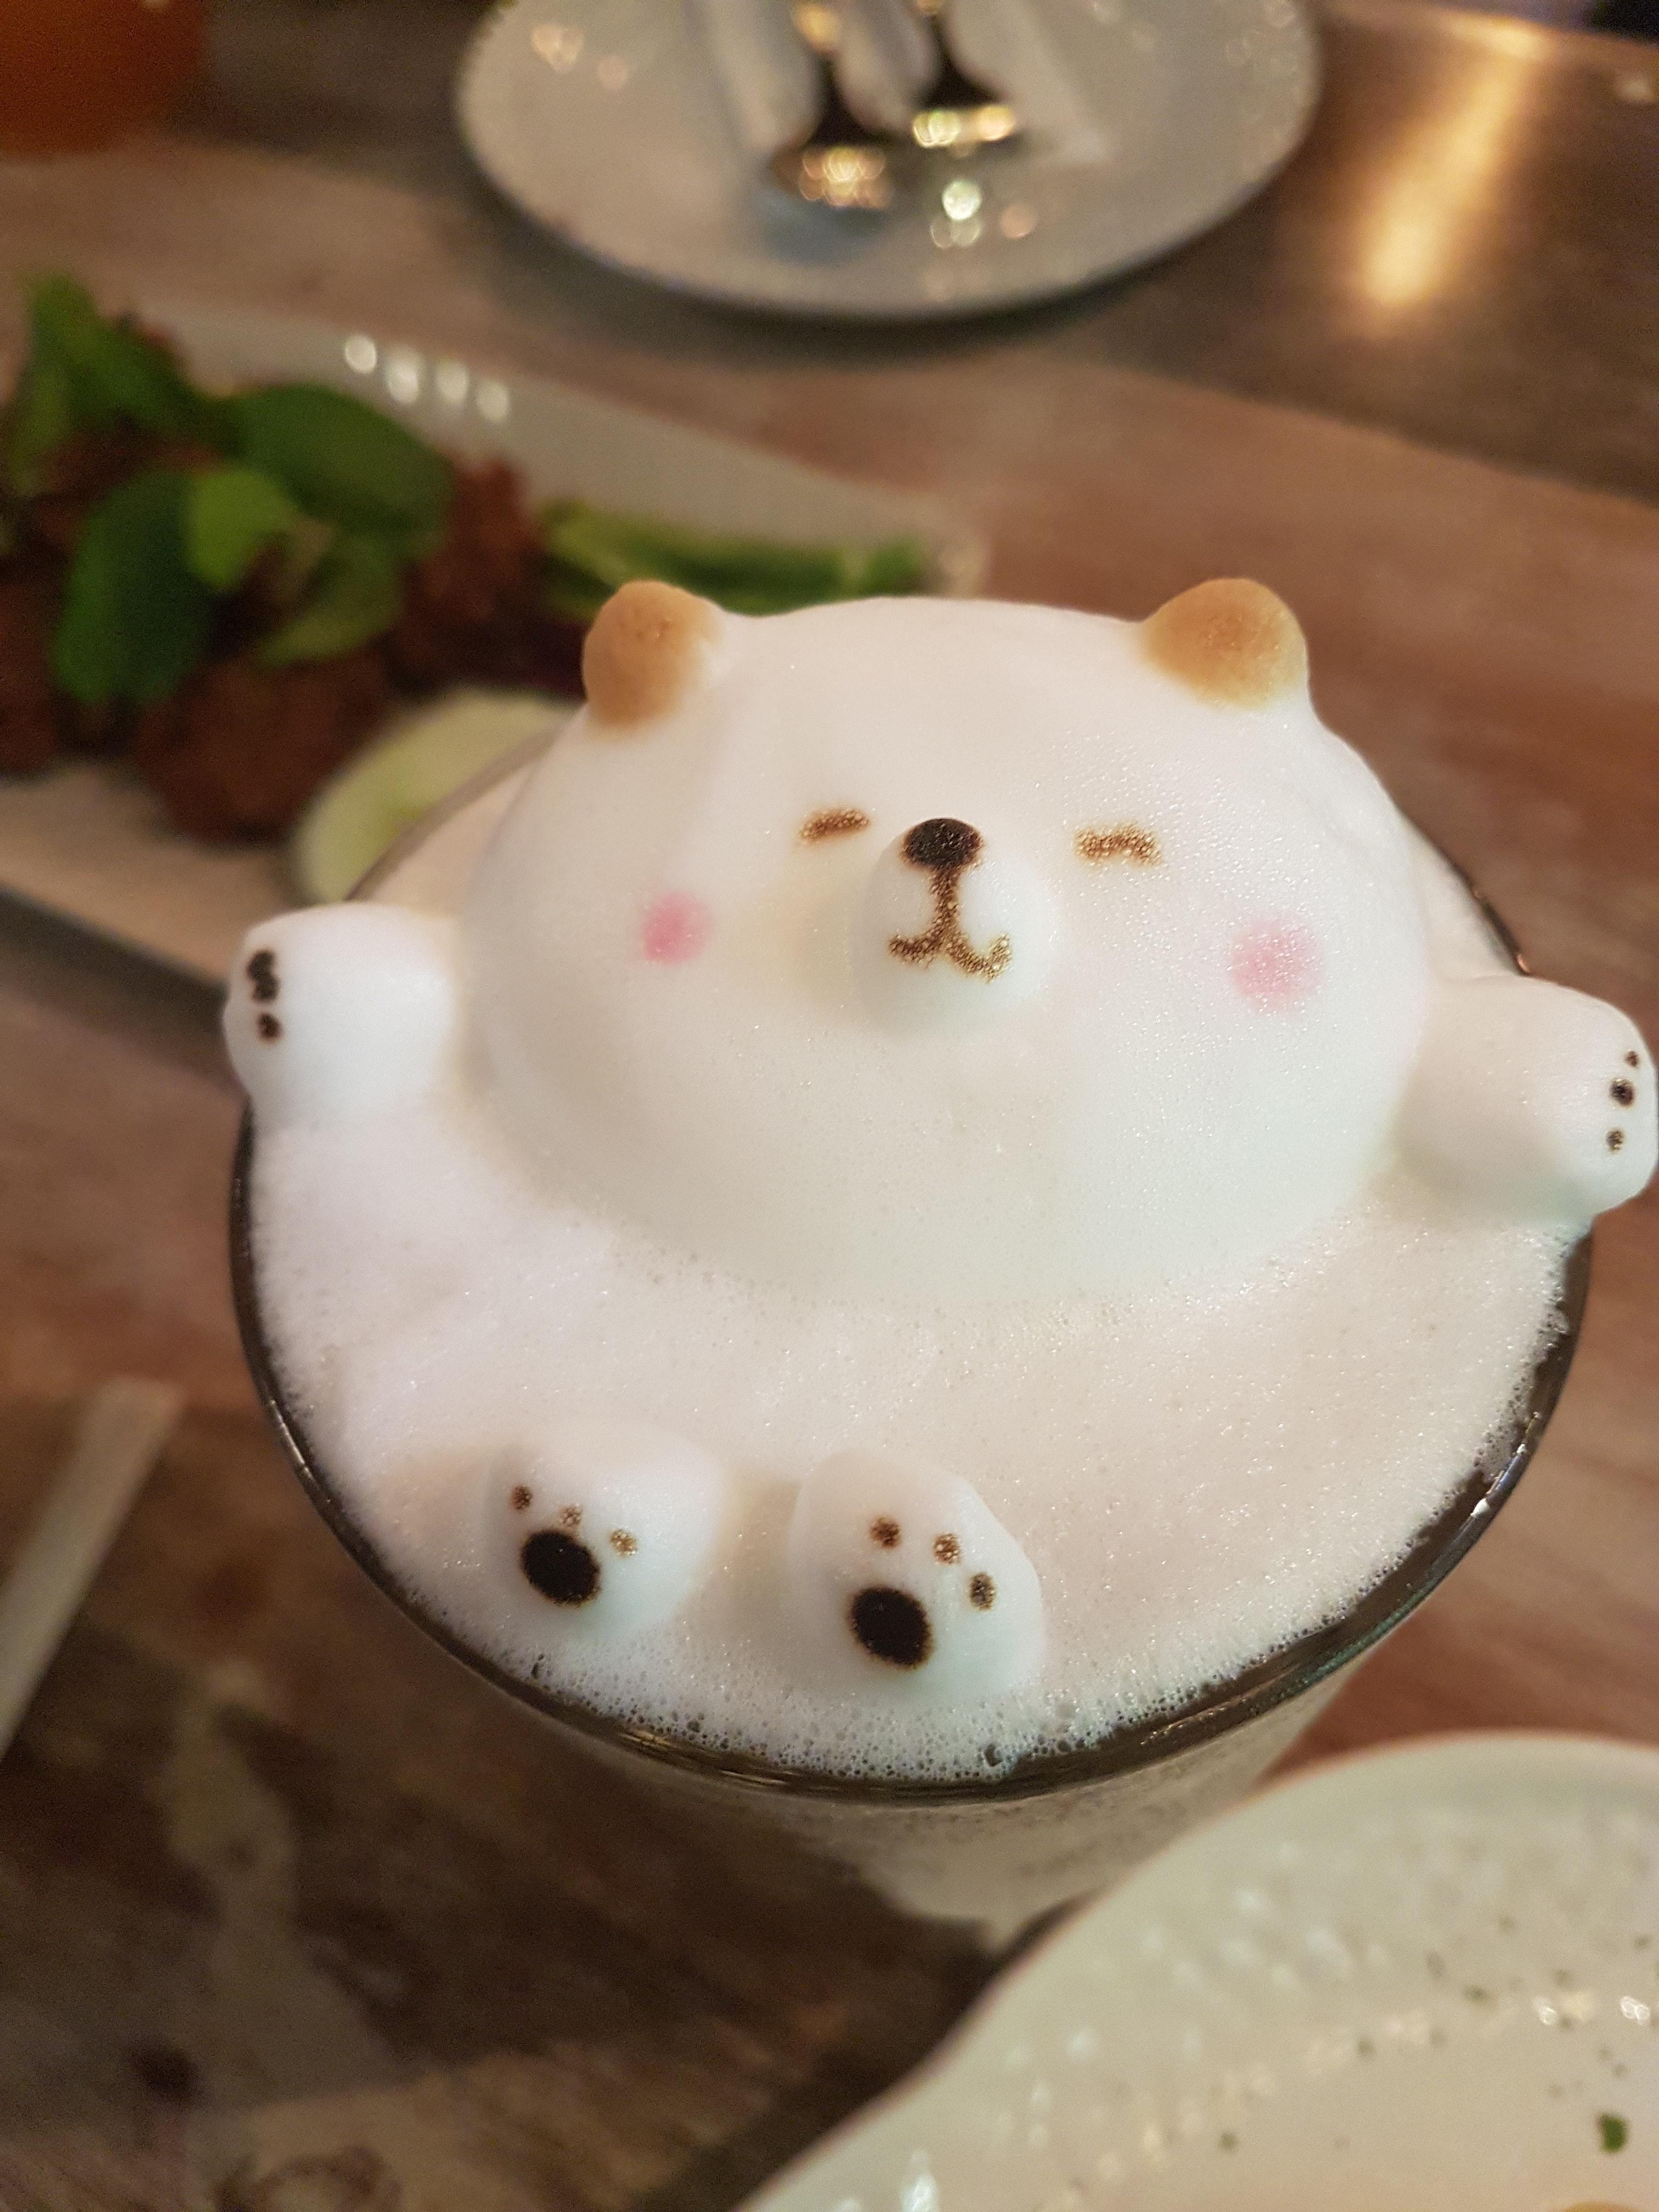 art-bear-beverage-1436172